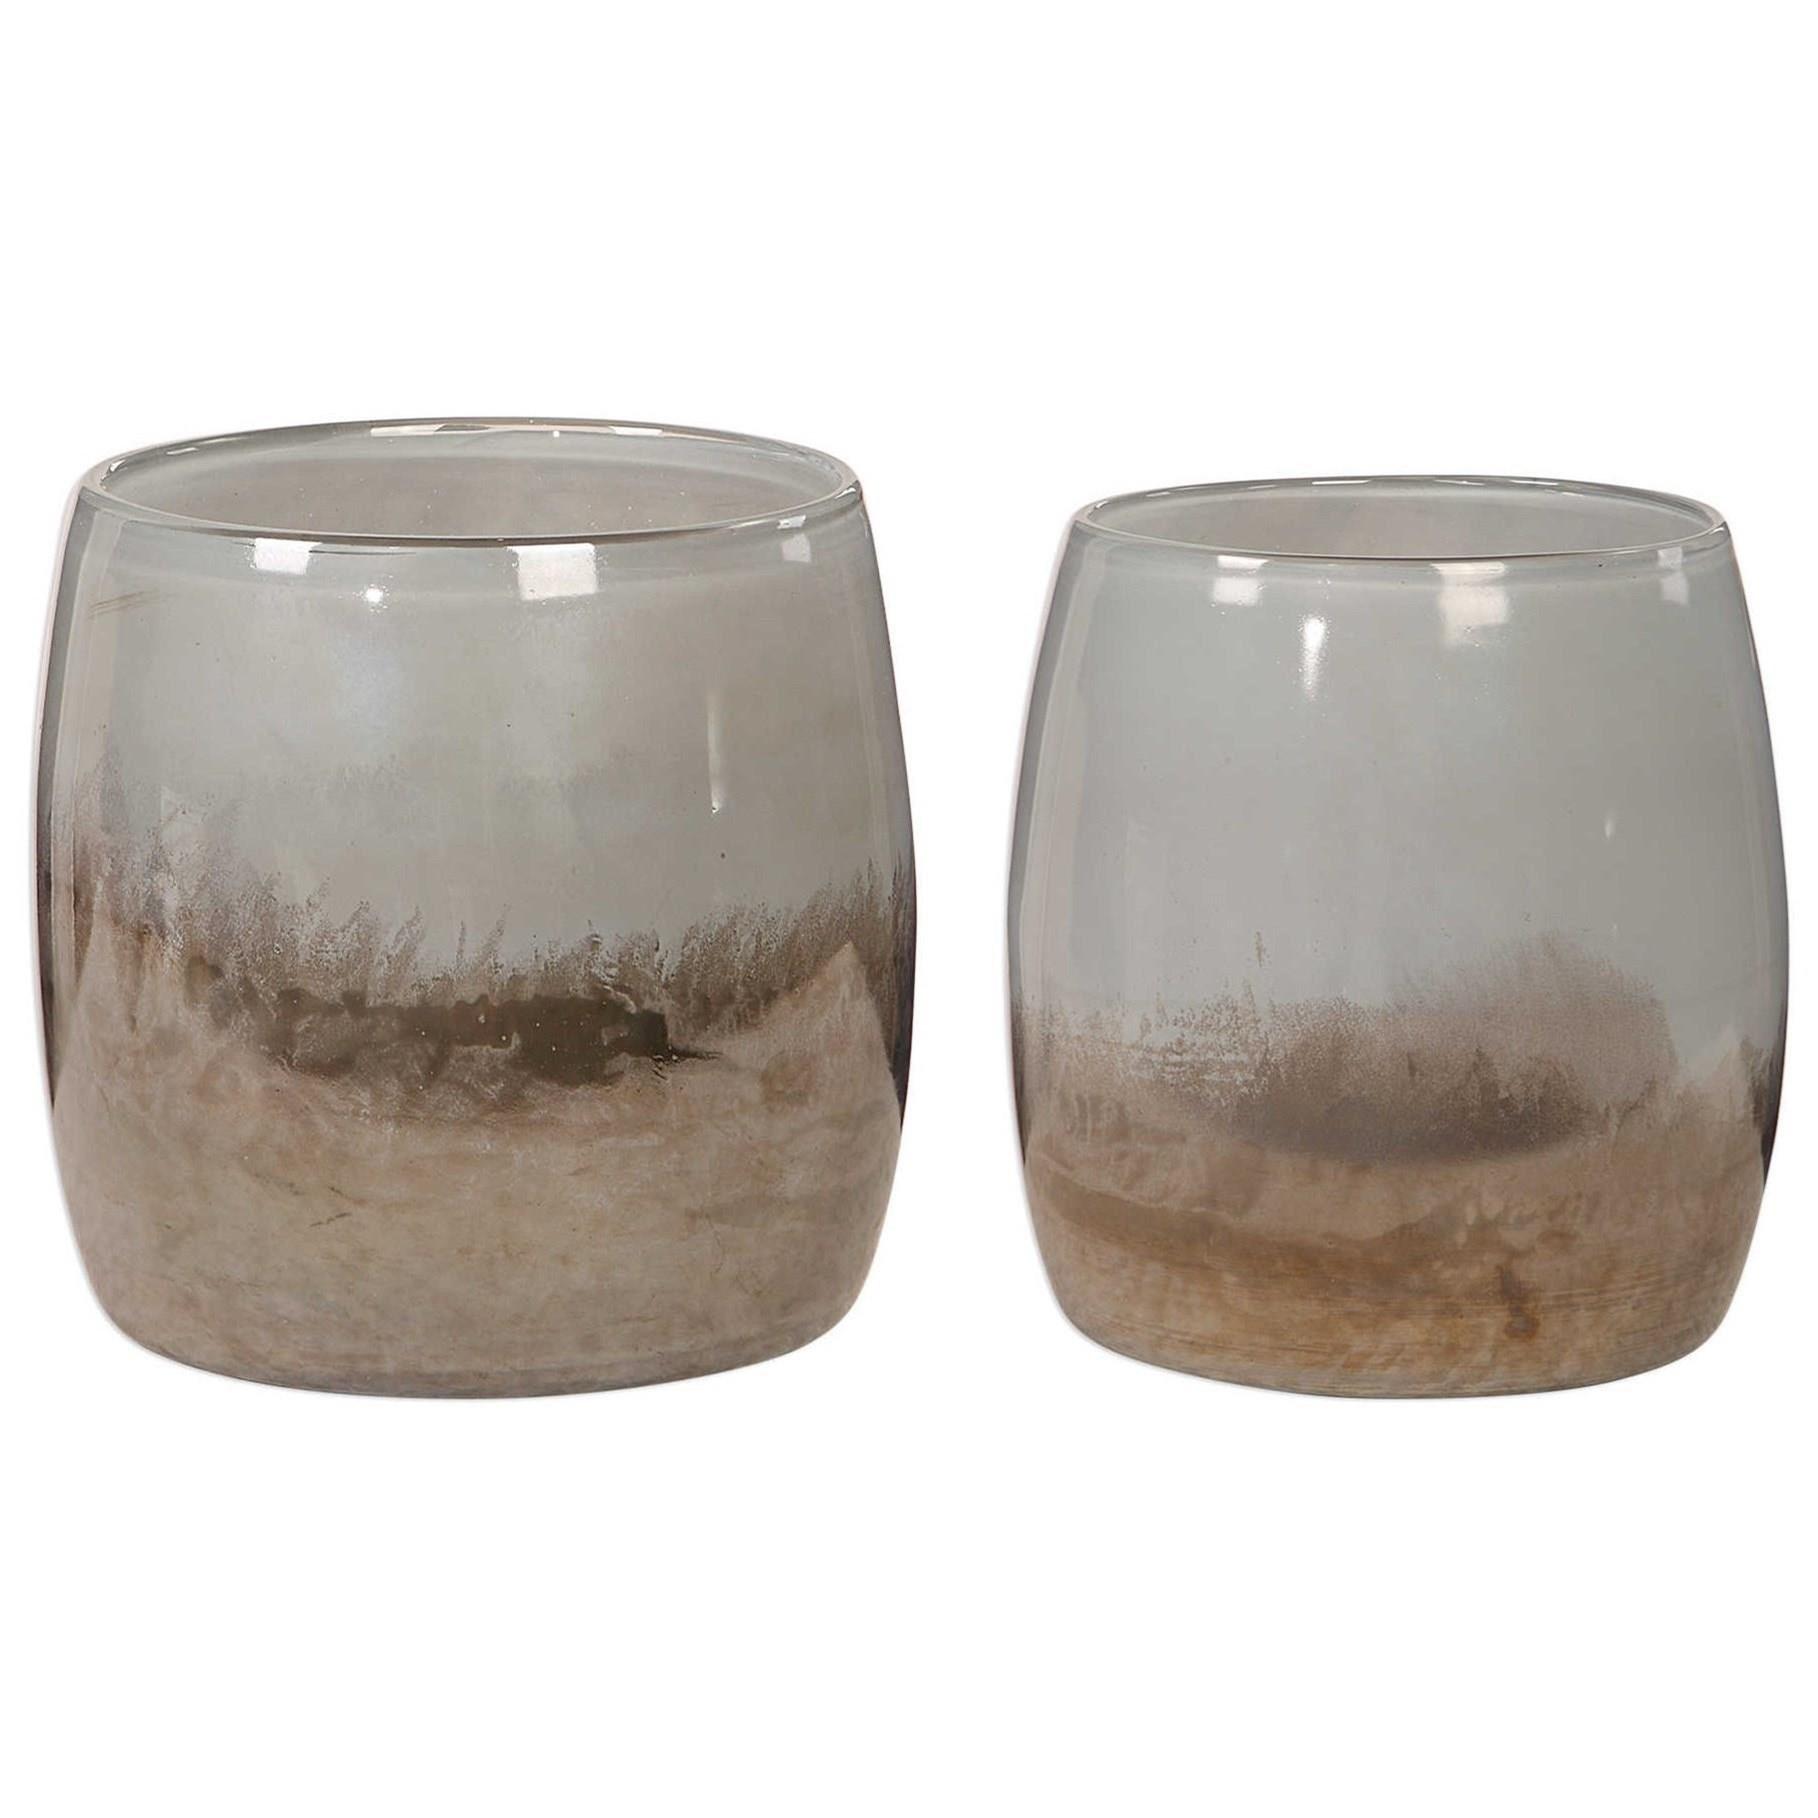 Tinley Blown Glass Bowls, S/2